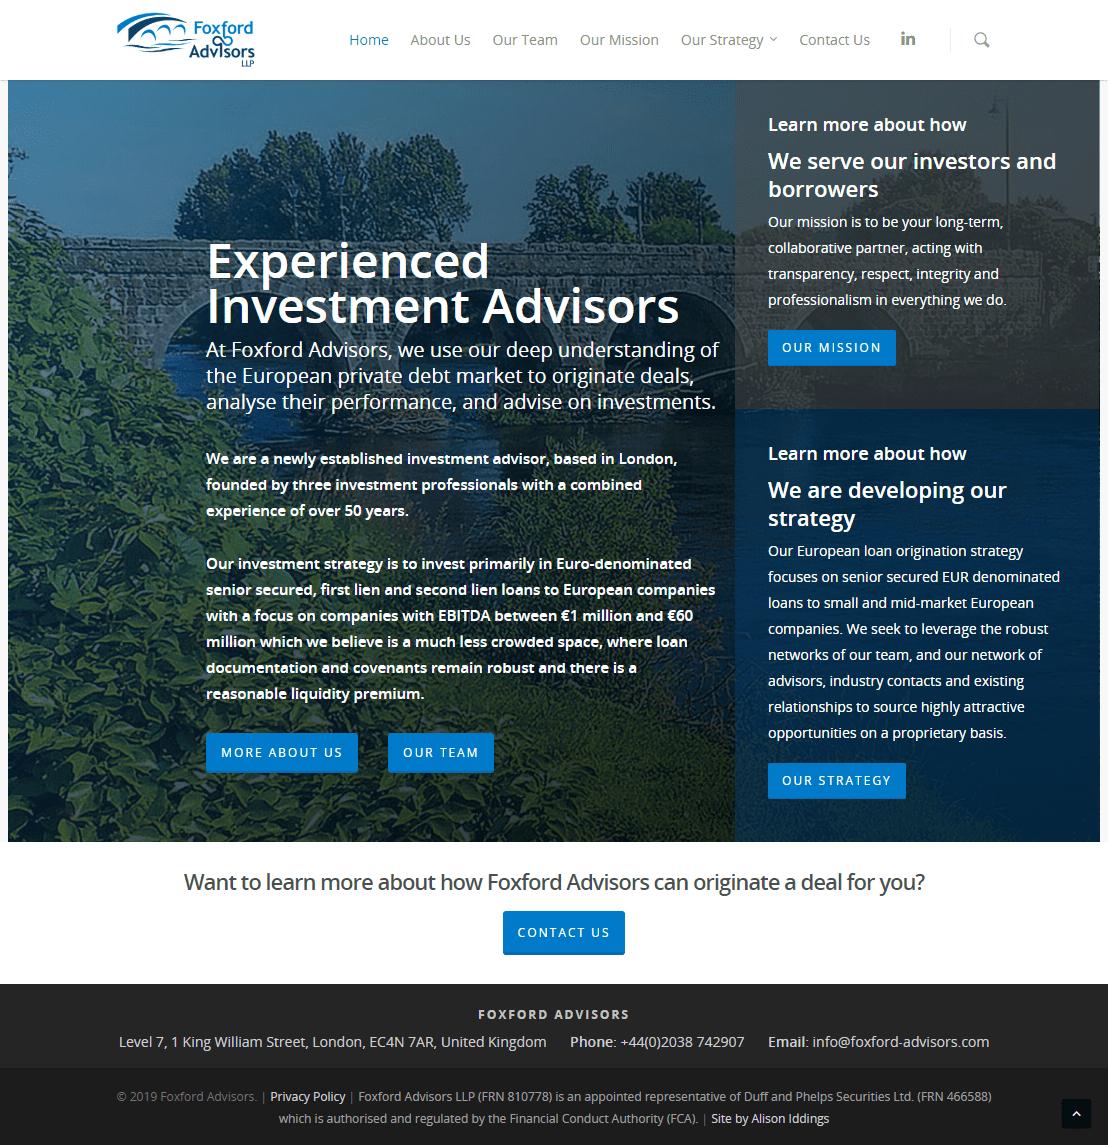 FoxFord Advisors